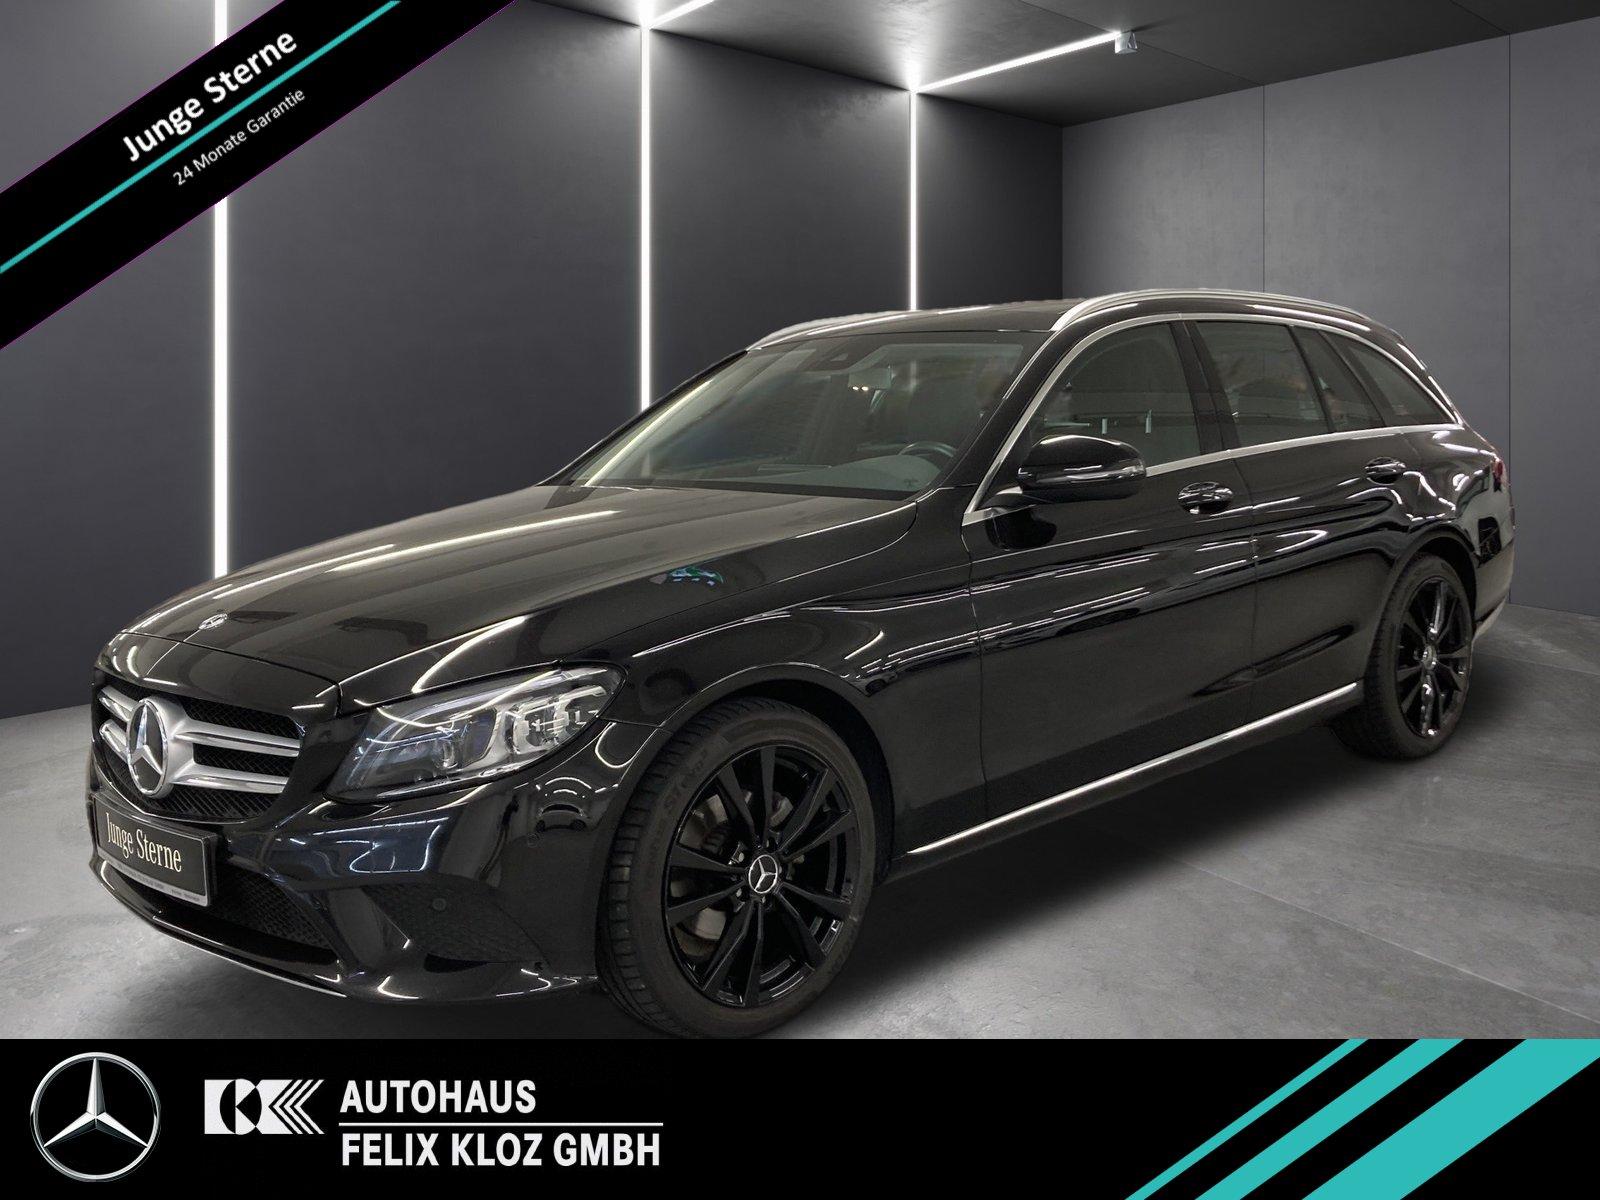 Mercedes-Benz C 180 T Avantgarde*Pano*MultiBeam*Comand*AHK*Cam, Jahr 2018, Benzin